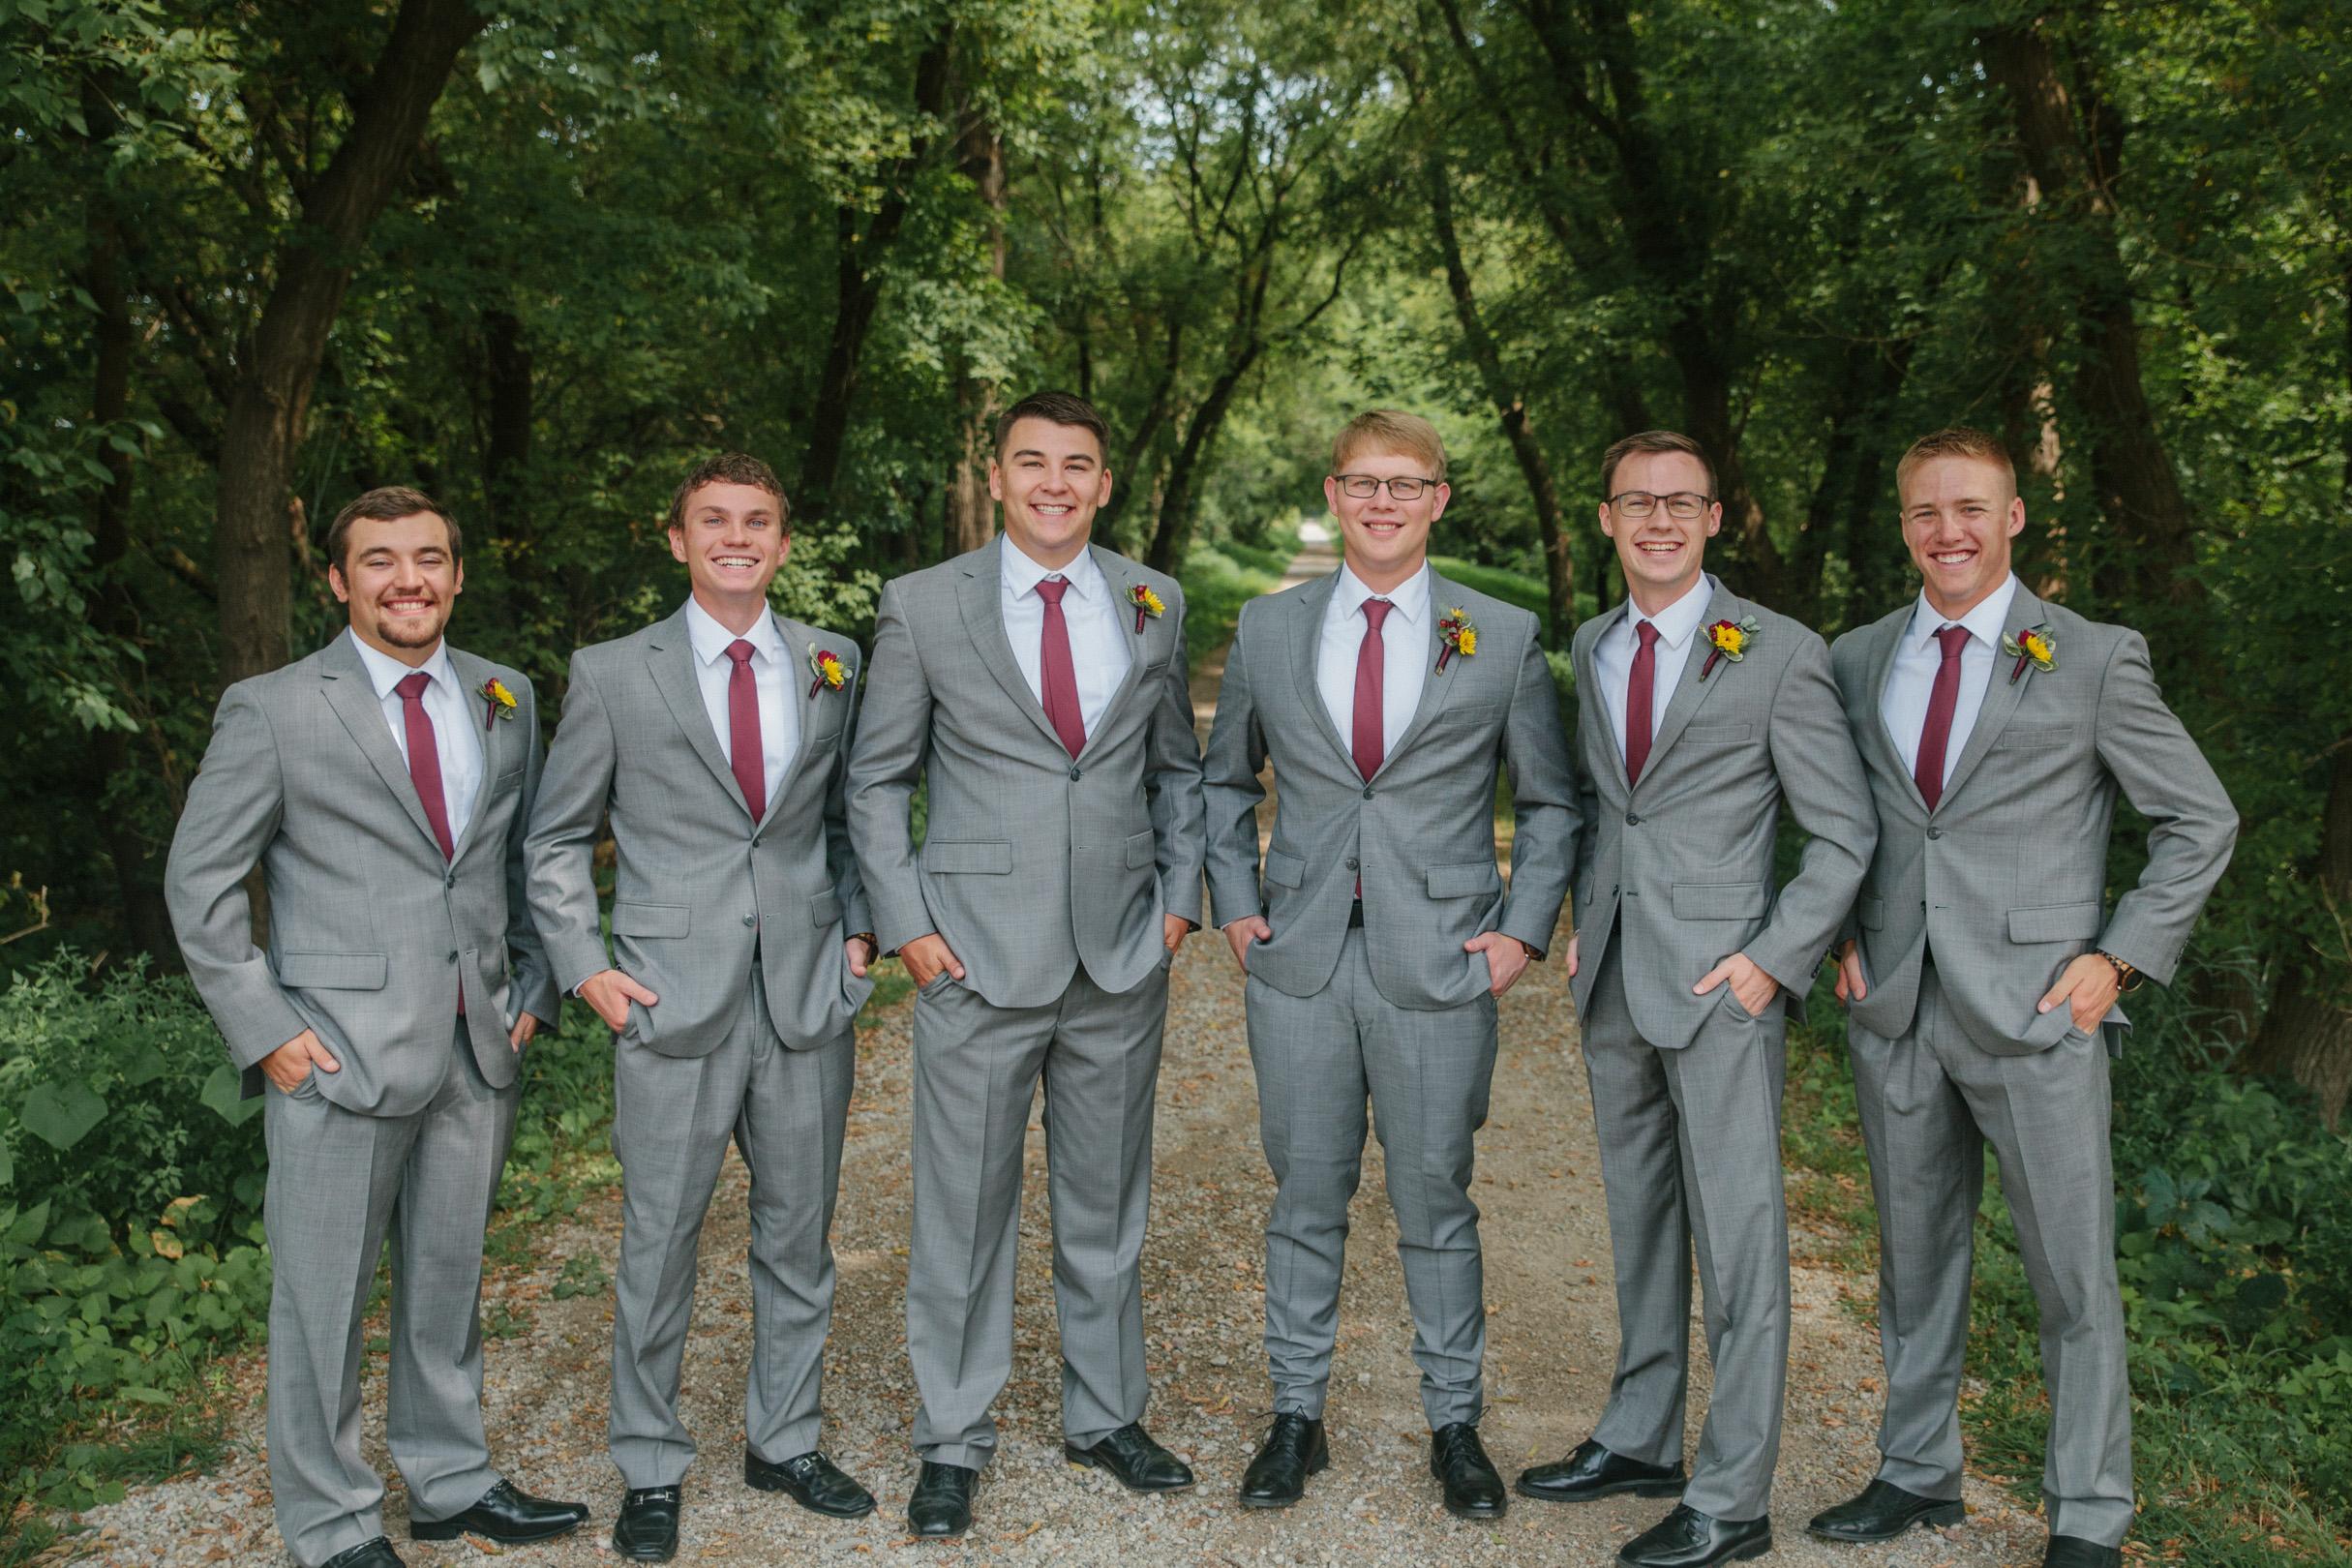 groom and groomsman photos